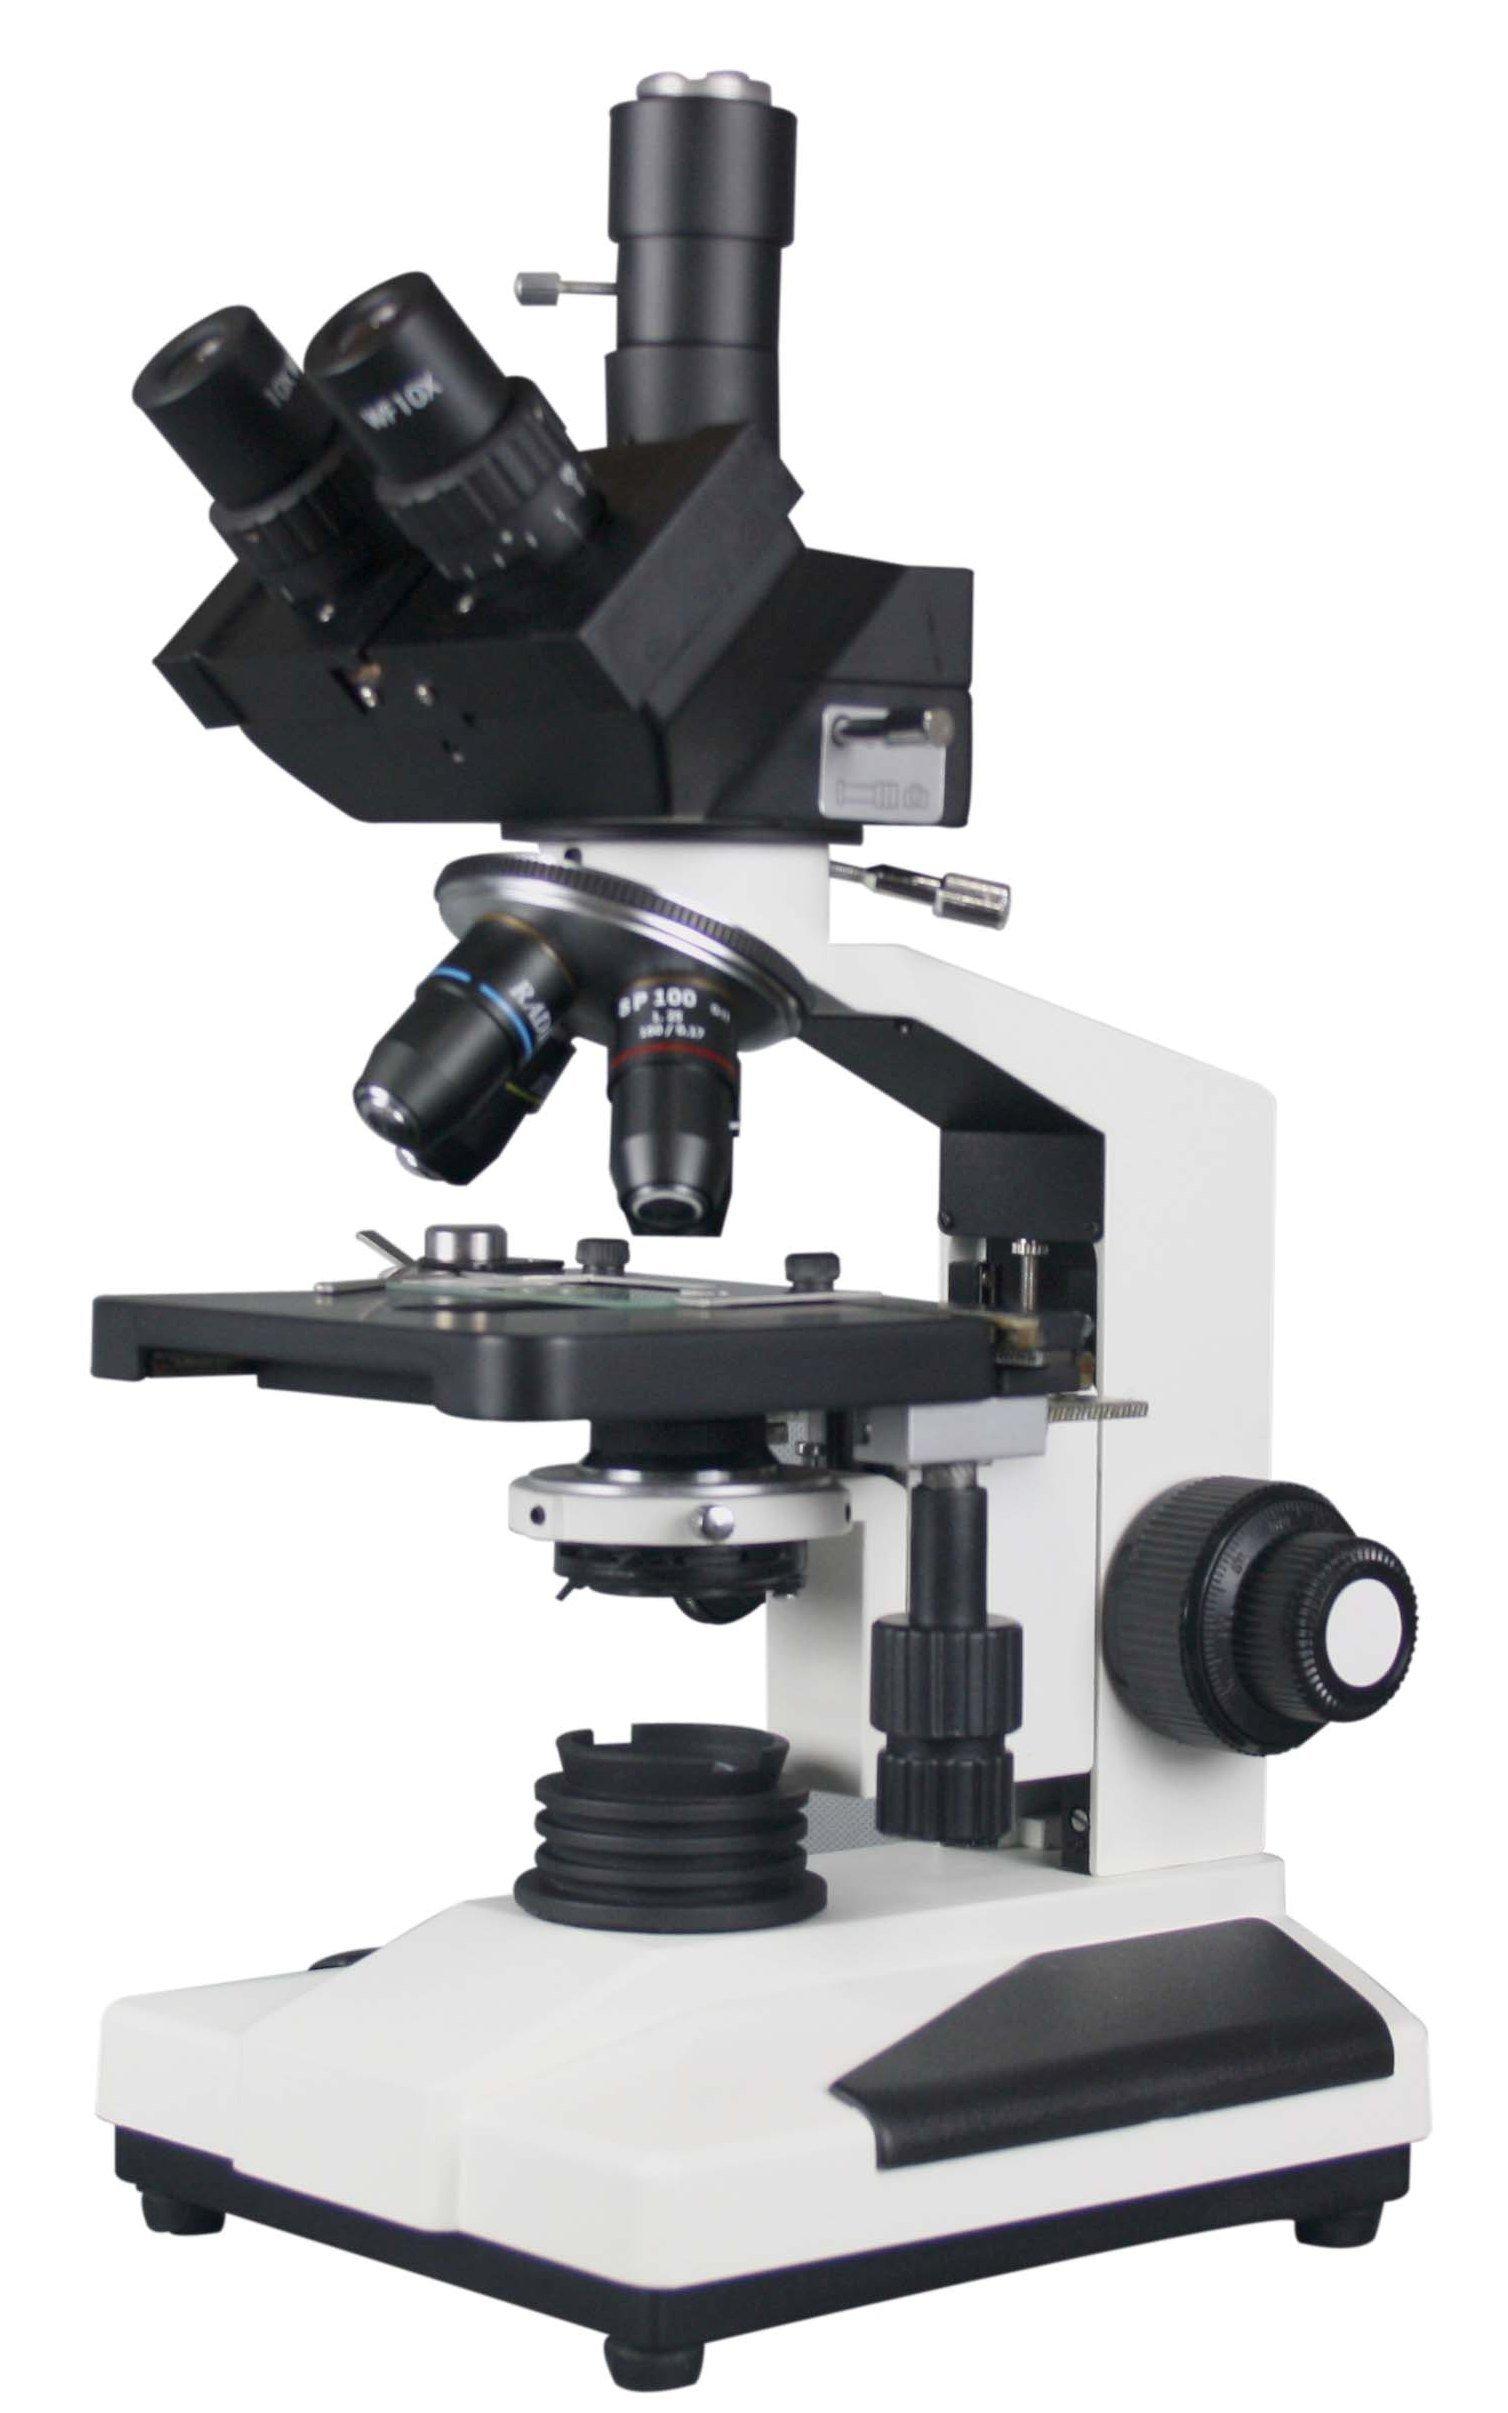 Radical 2500x Professional Quality Biology Trinocular Clinical LED Microscope SEMI PLAN Objective by Radical